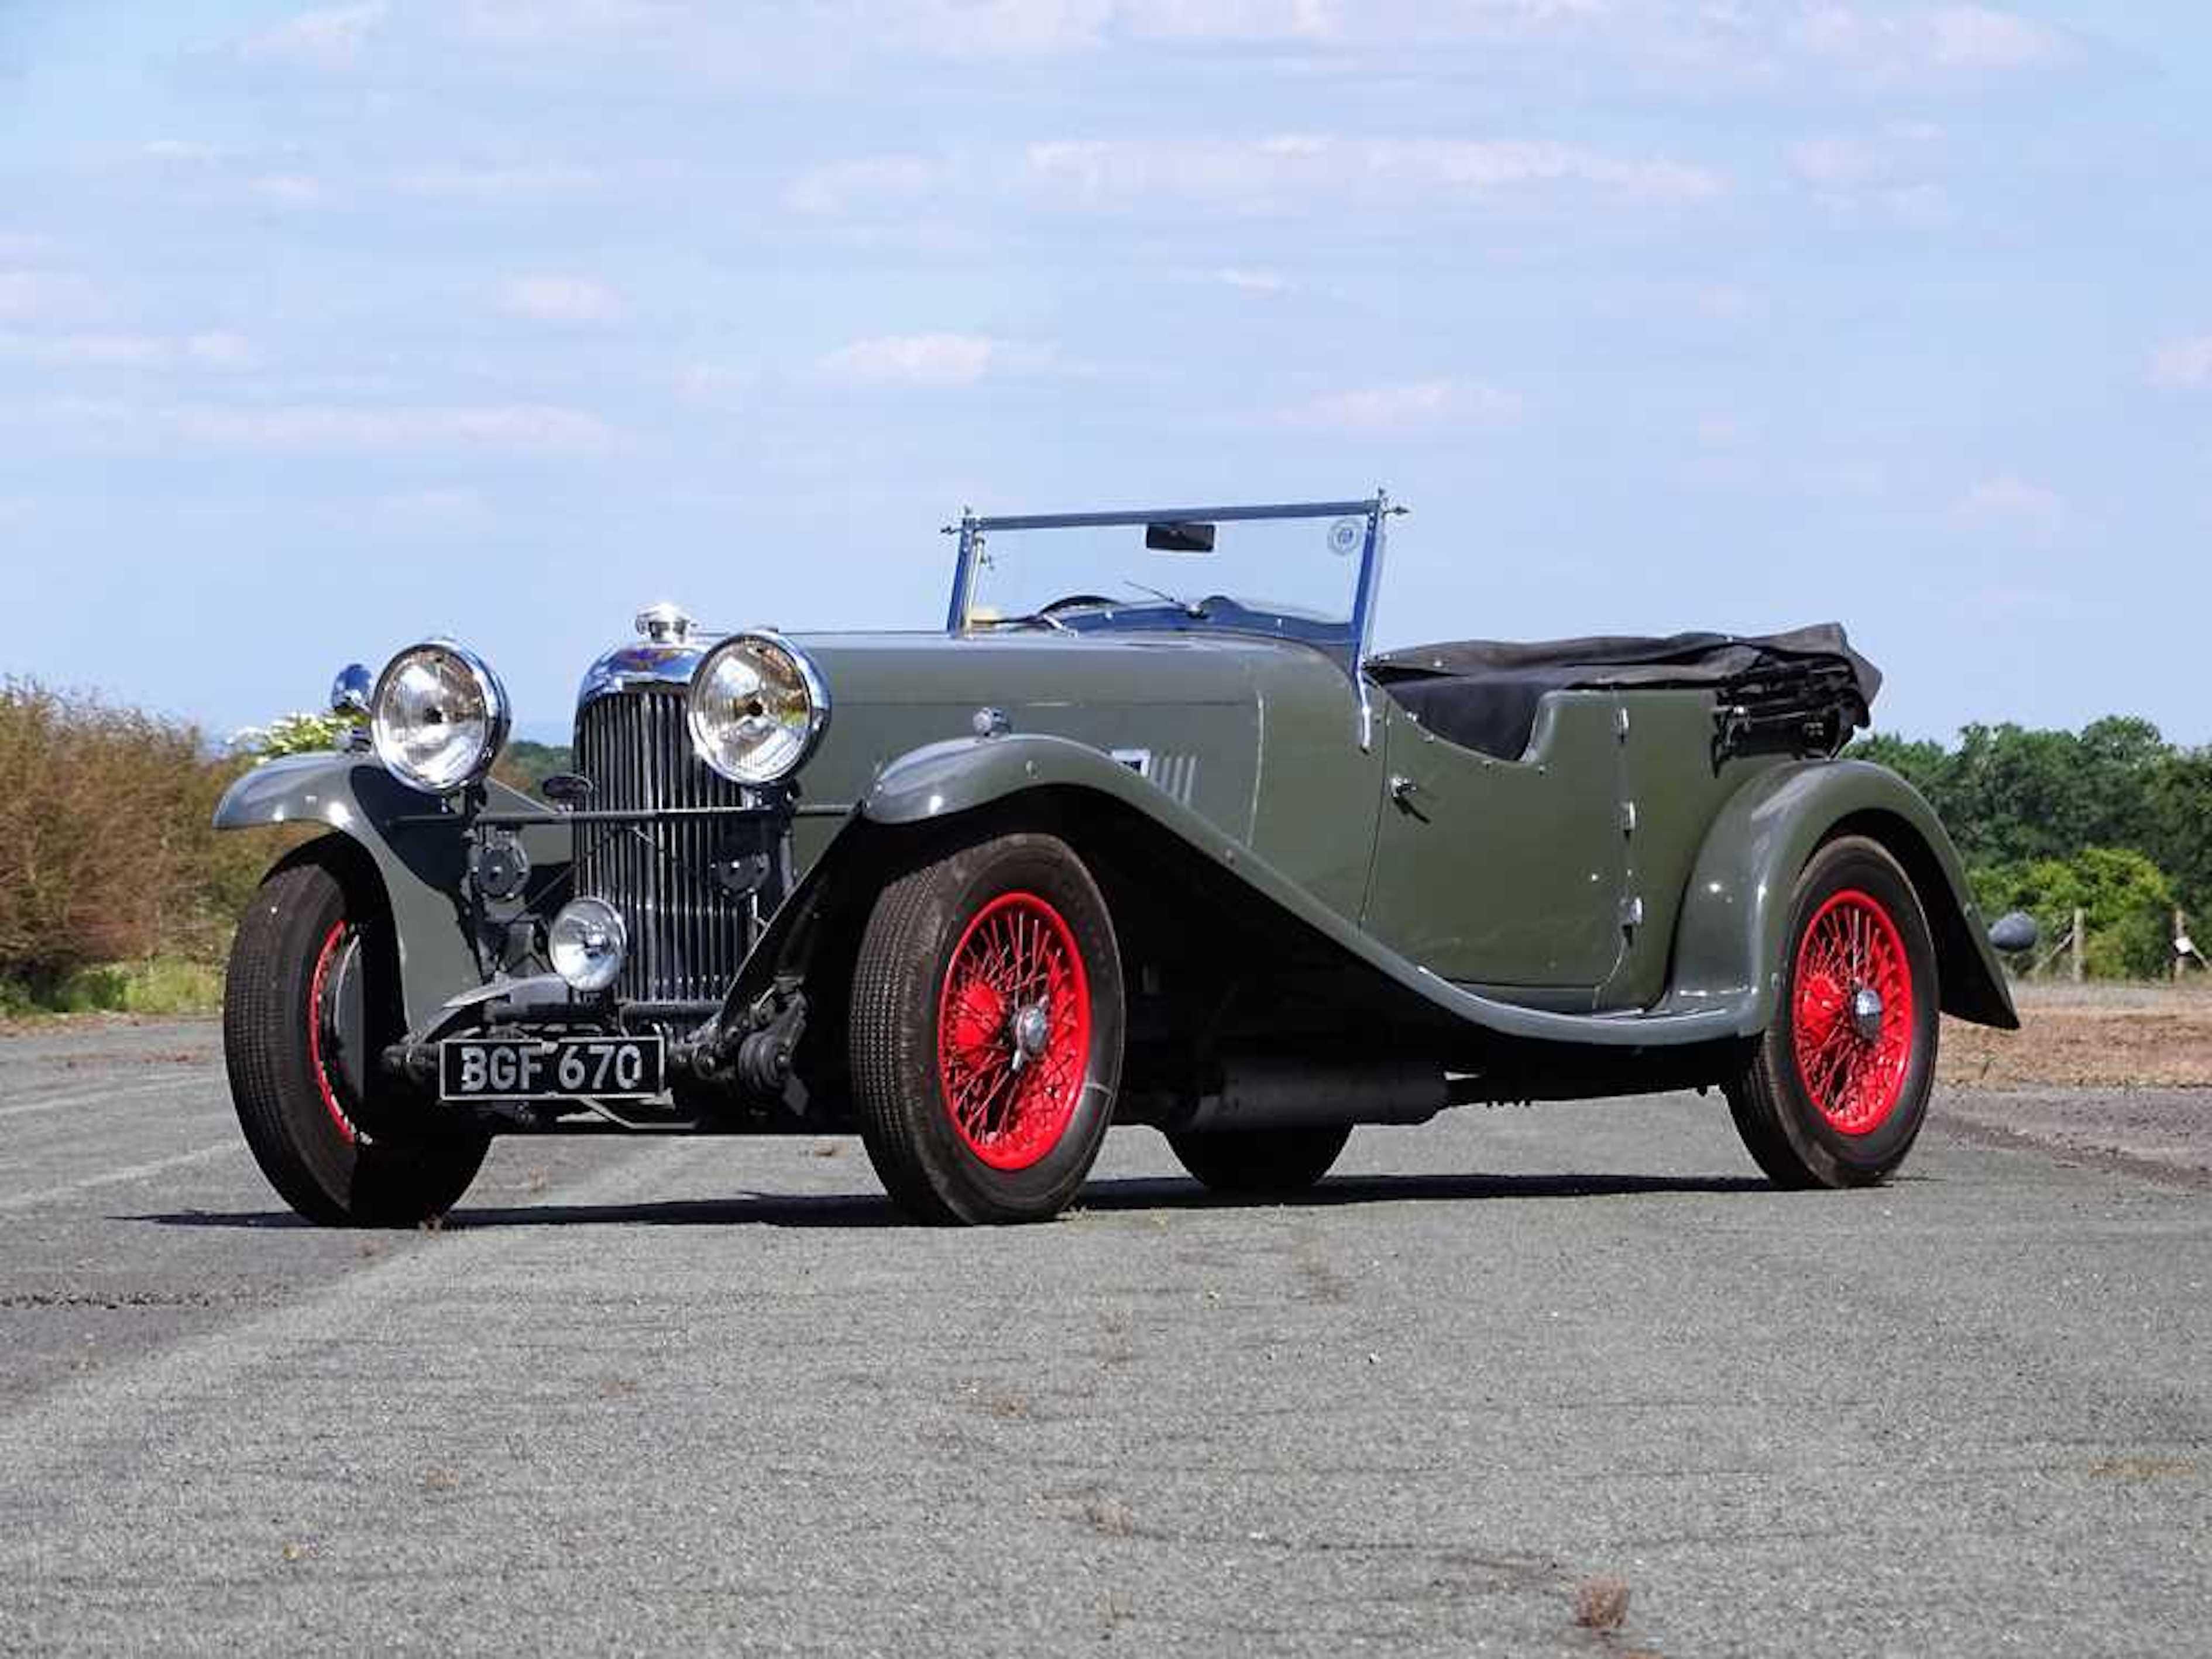 1934 Lagonda M45 T7 Tourer.